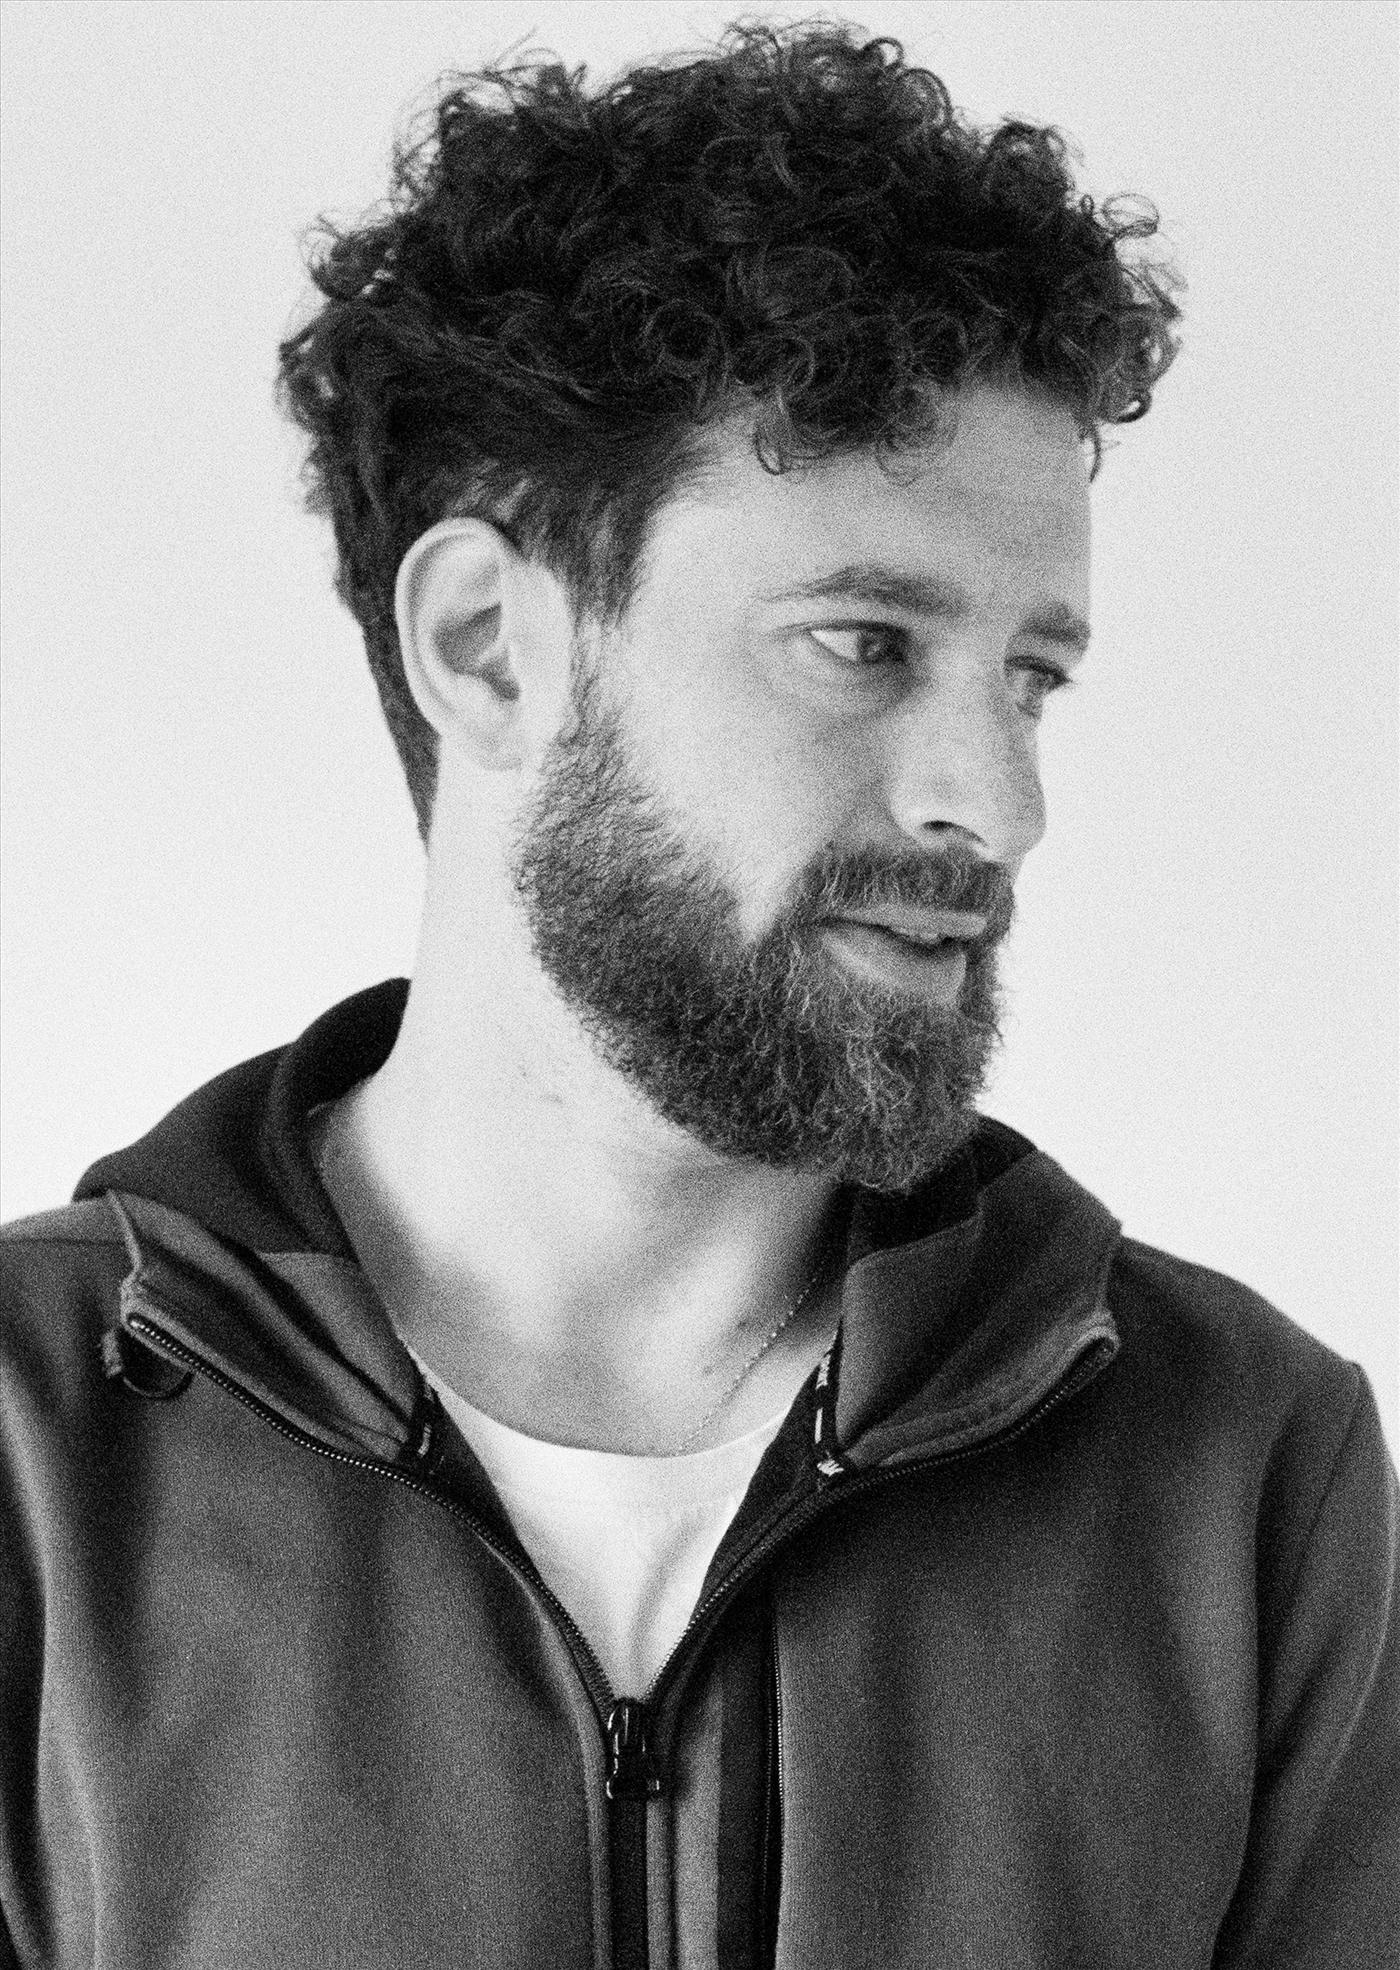 Gabriel Itkes Sznap